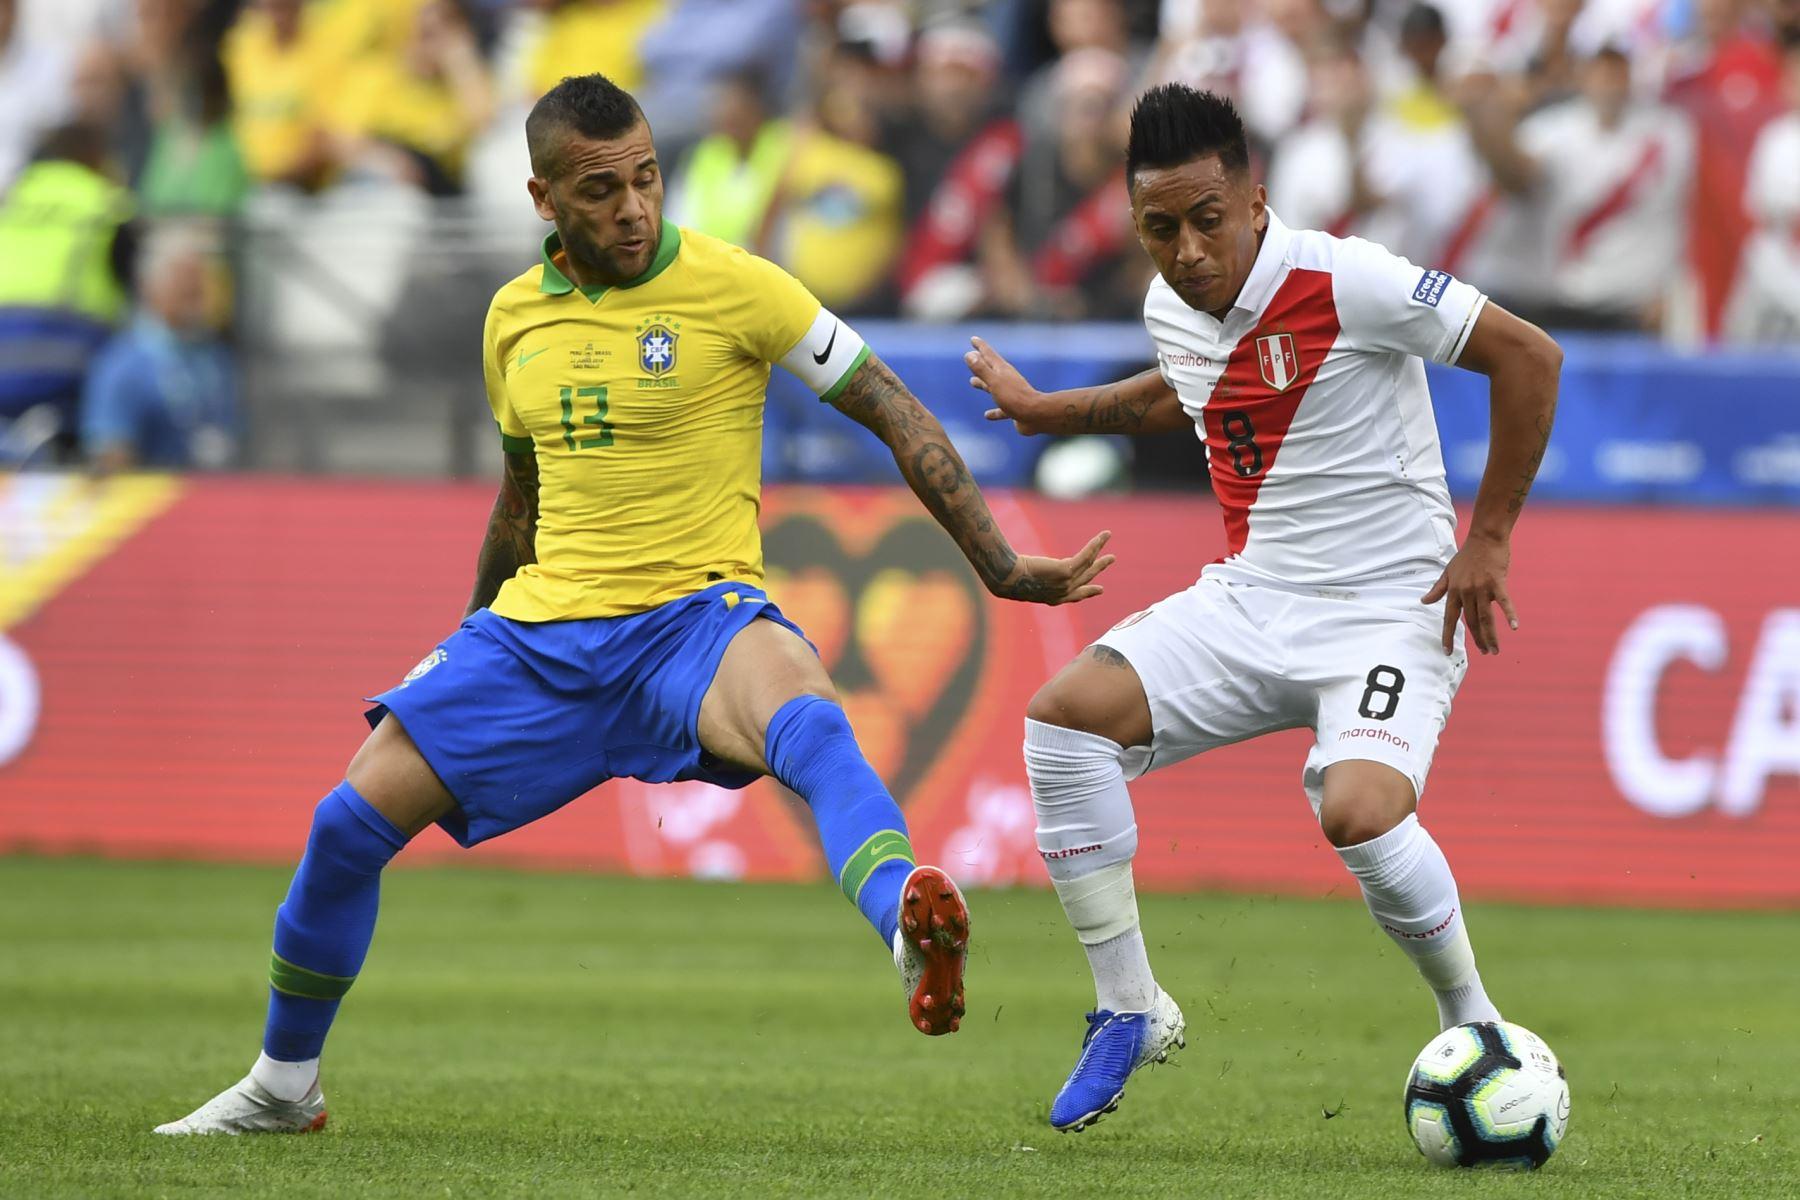 Dani Alves (L), de Brasil, marca a Christian Cueva de Perú durante su partido de torneo de fútbol de la Copa América. Foto:AFP